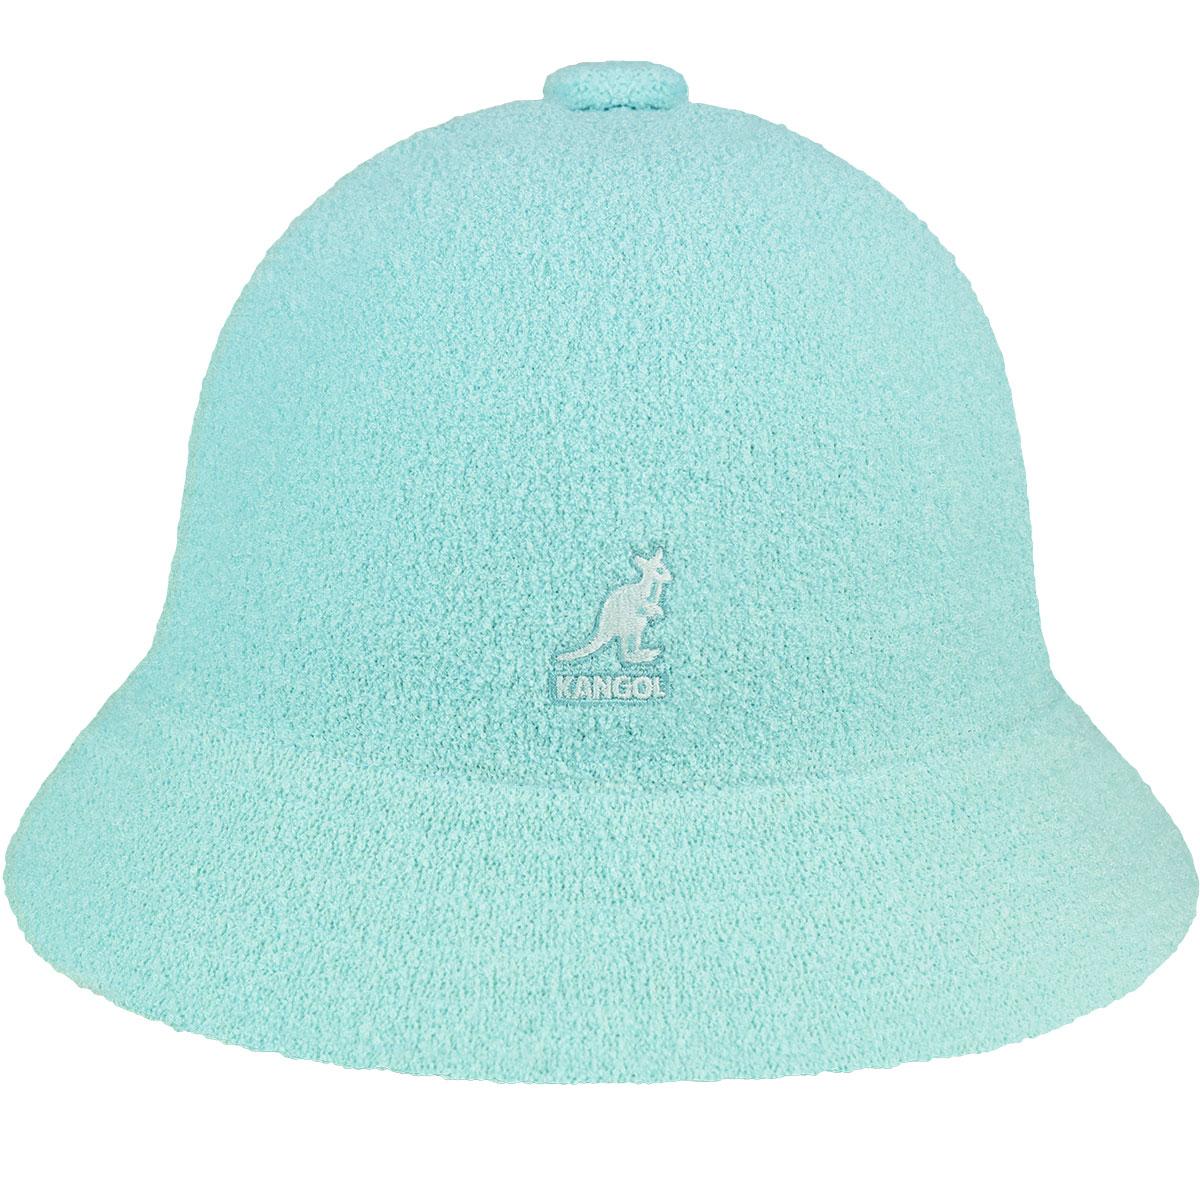 Kangol Mens Bermuda Casual Bucket Hat Classic Style